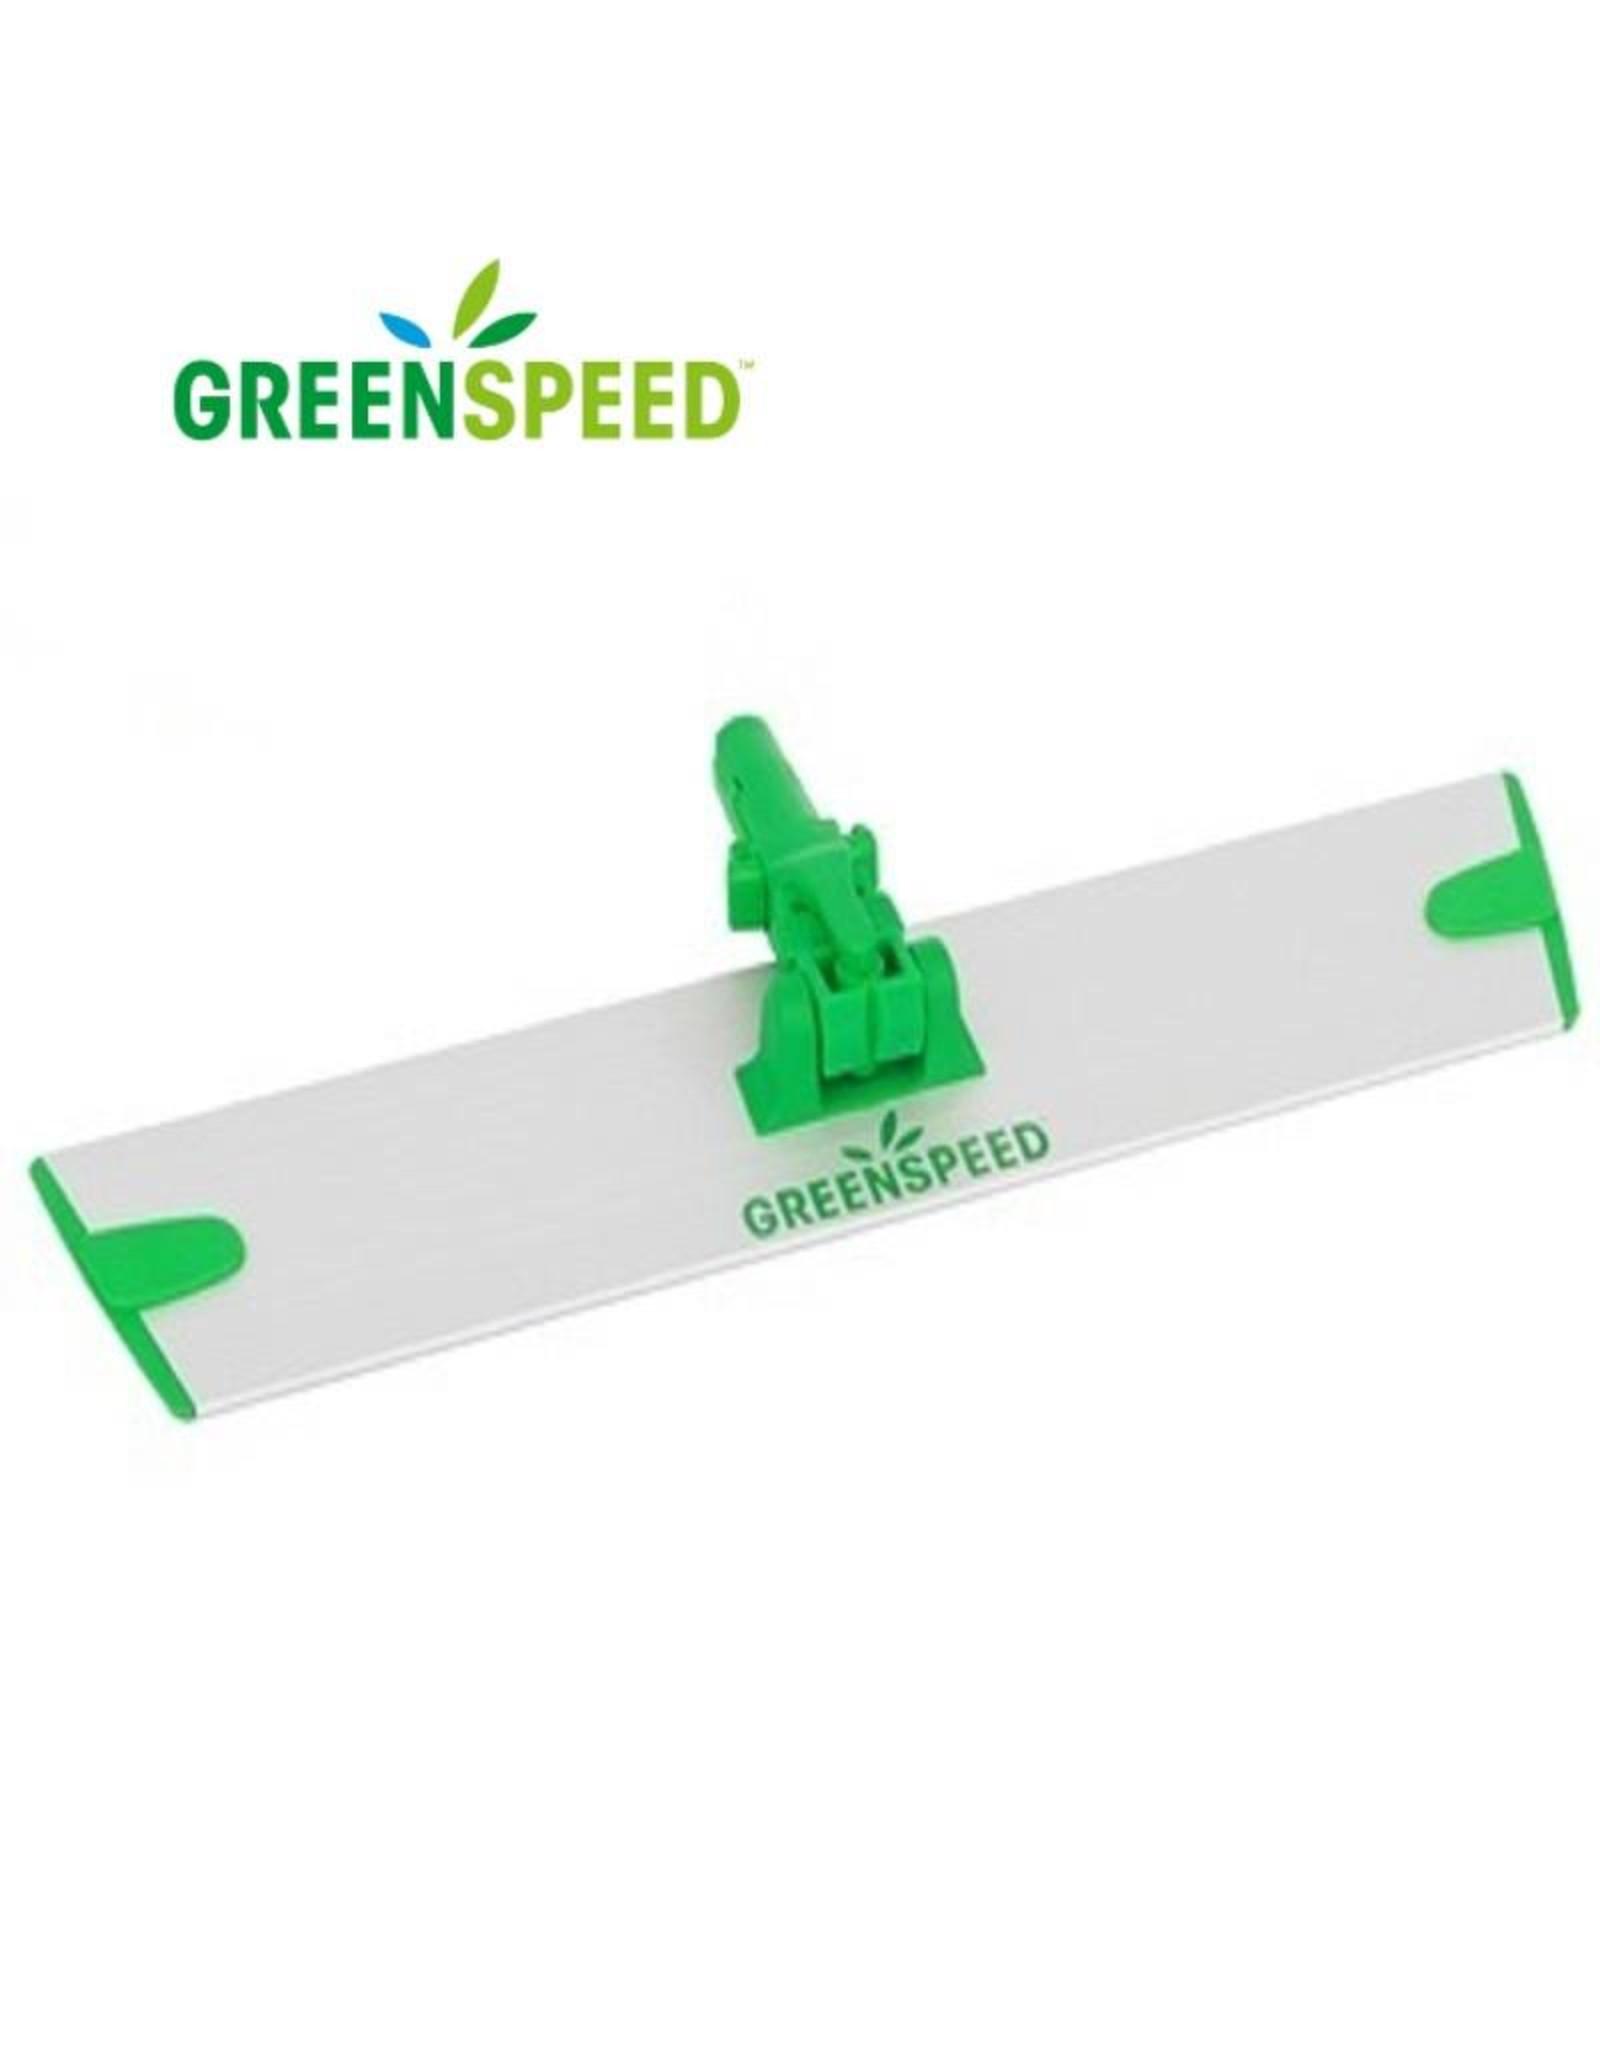 Greenspeed Greenspeed Sprenkler vlakmopsysteem